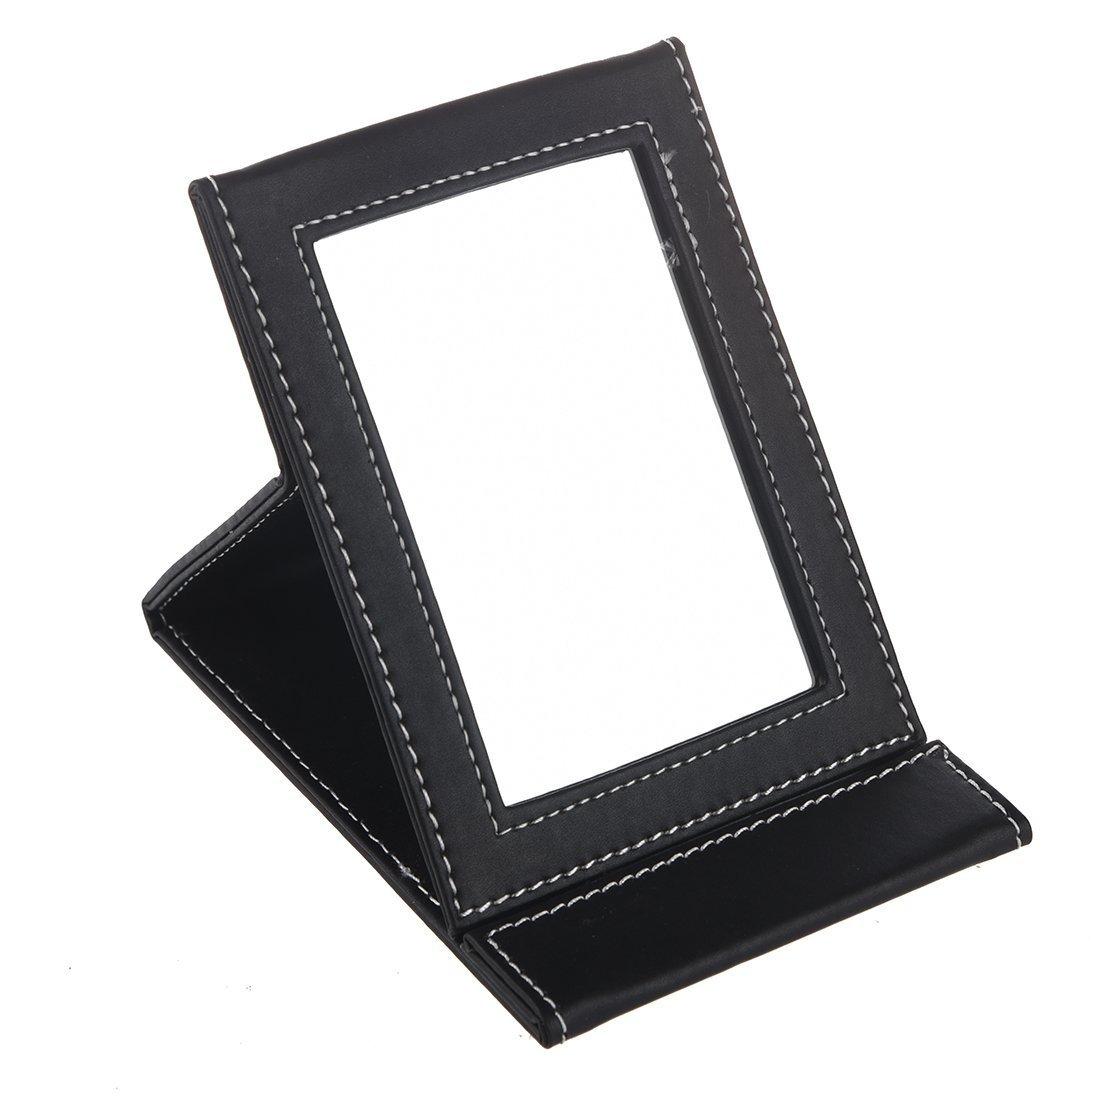 Miroir - TOOGOO(R)Maquillage Miroir Voyage Cuir Pliable Portable Miroir Noir SHOMAGT31262